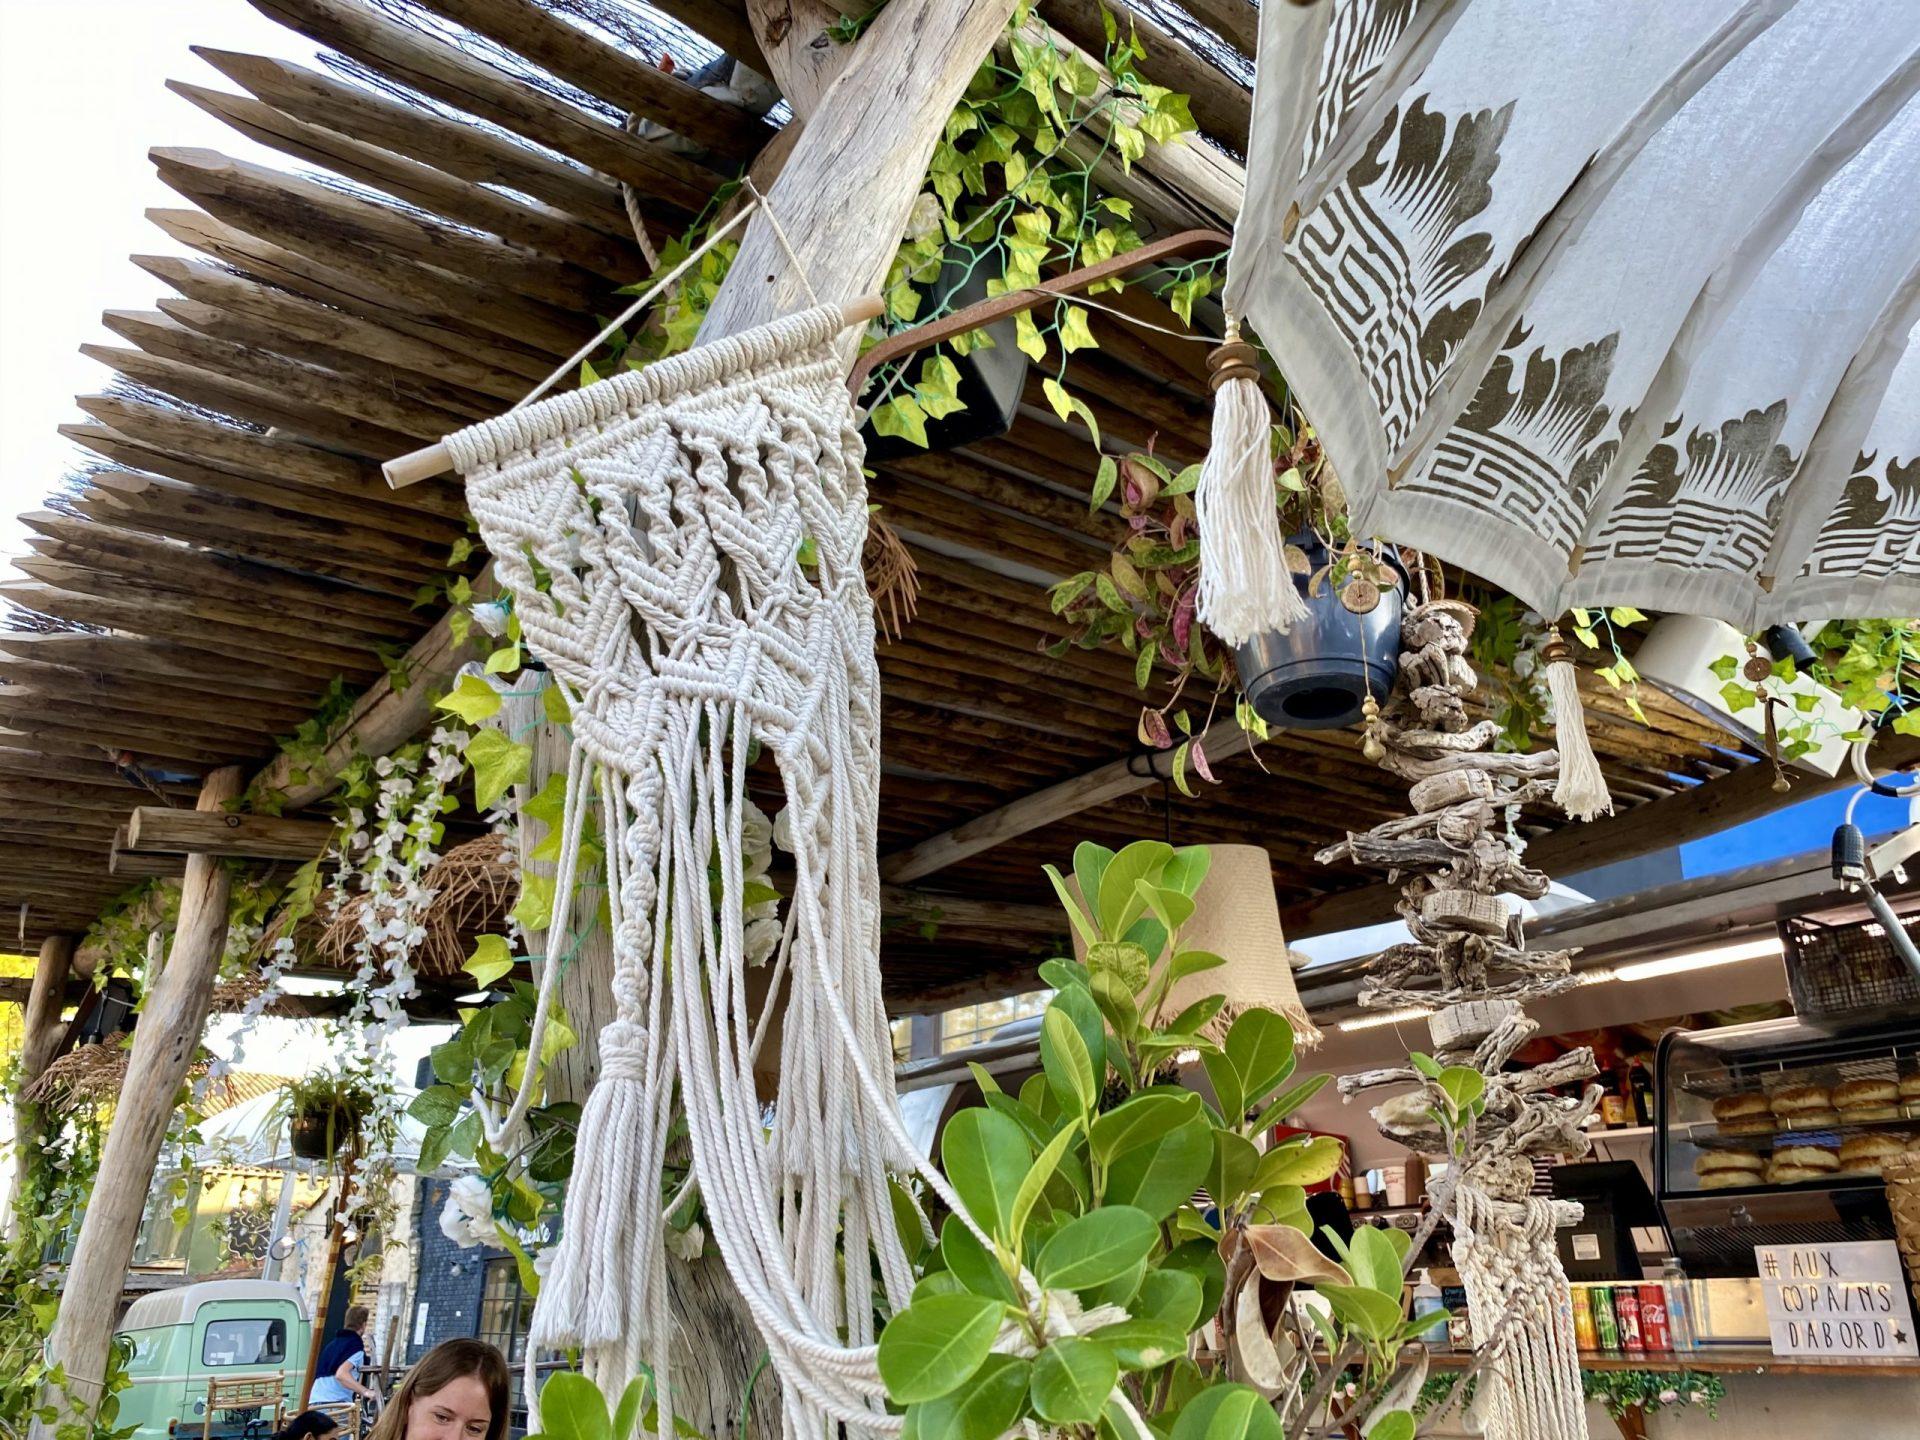 pergolas bois flotté acacia sur mesure artisanale Hérault Gard